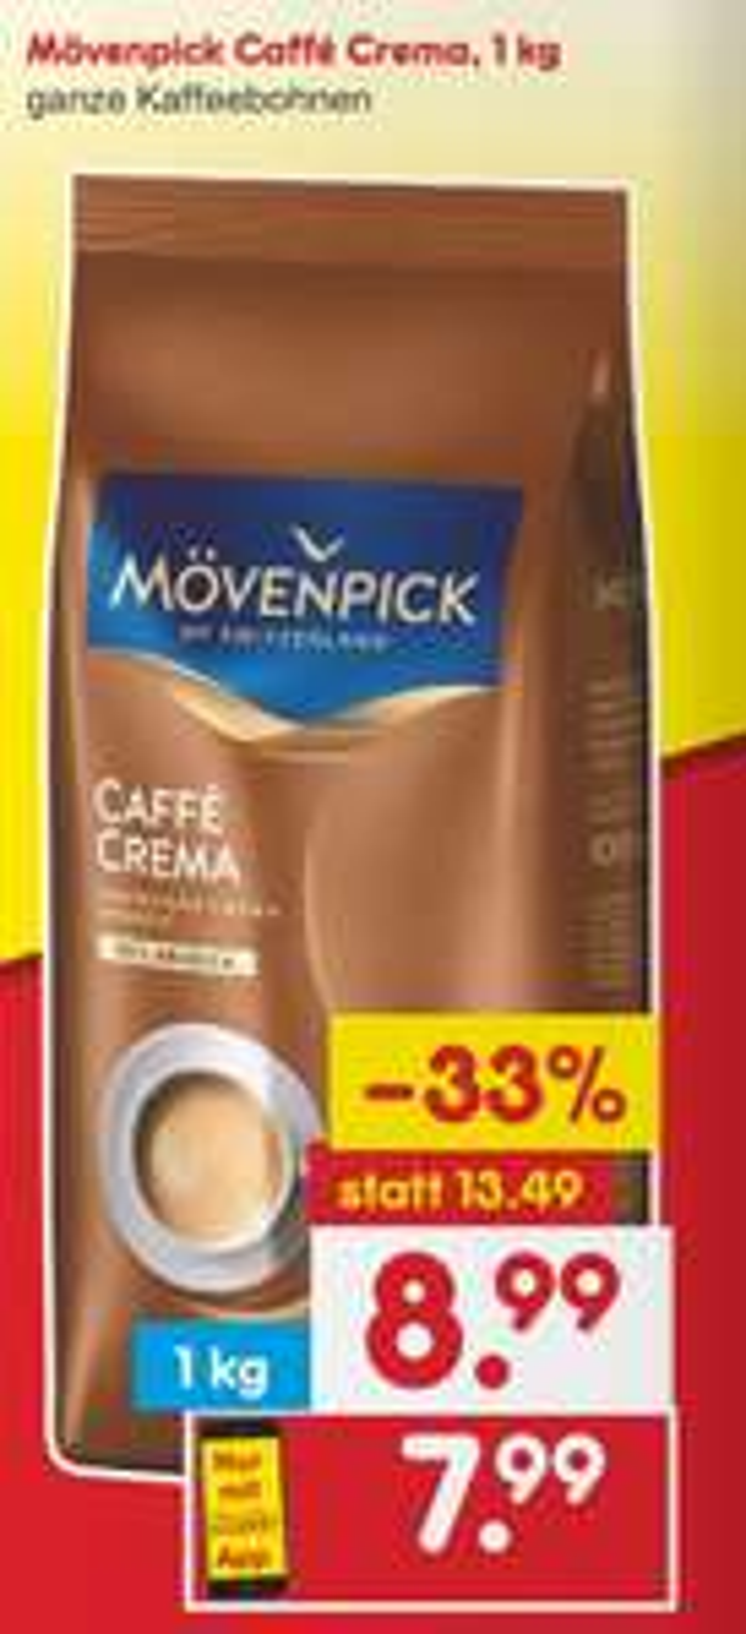 Netto: Mövenpick Caffè Crema Bohnen 1kg (1€ Rabattcoupon-mit Netto App)